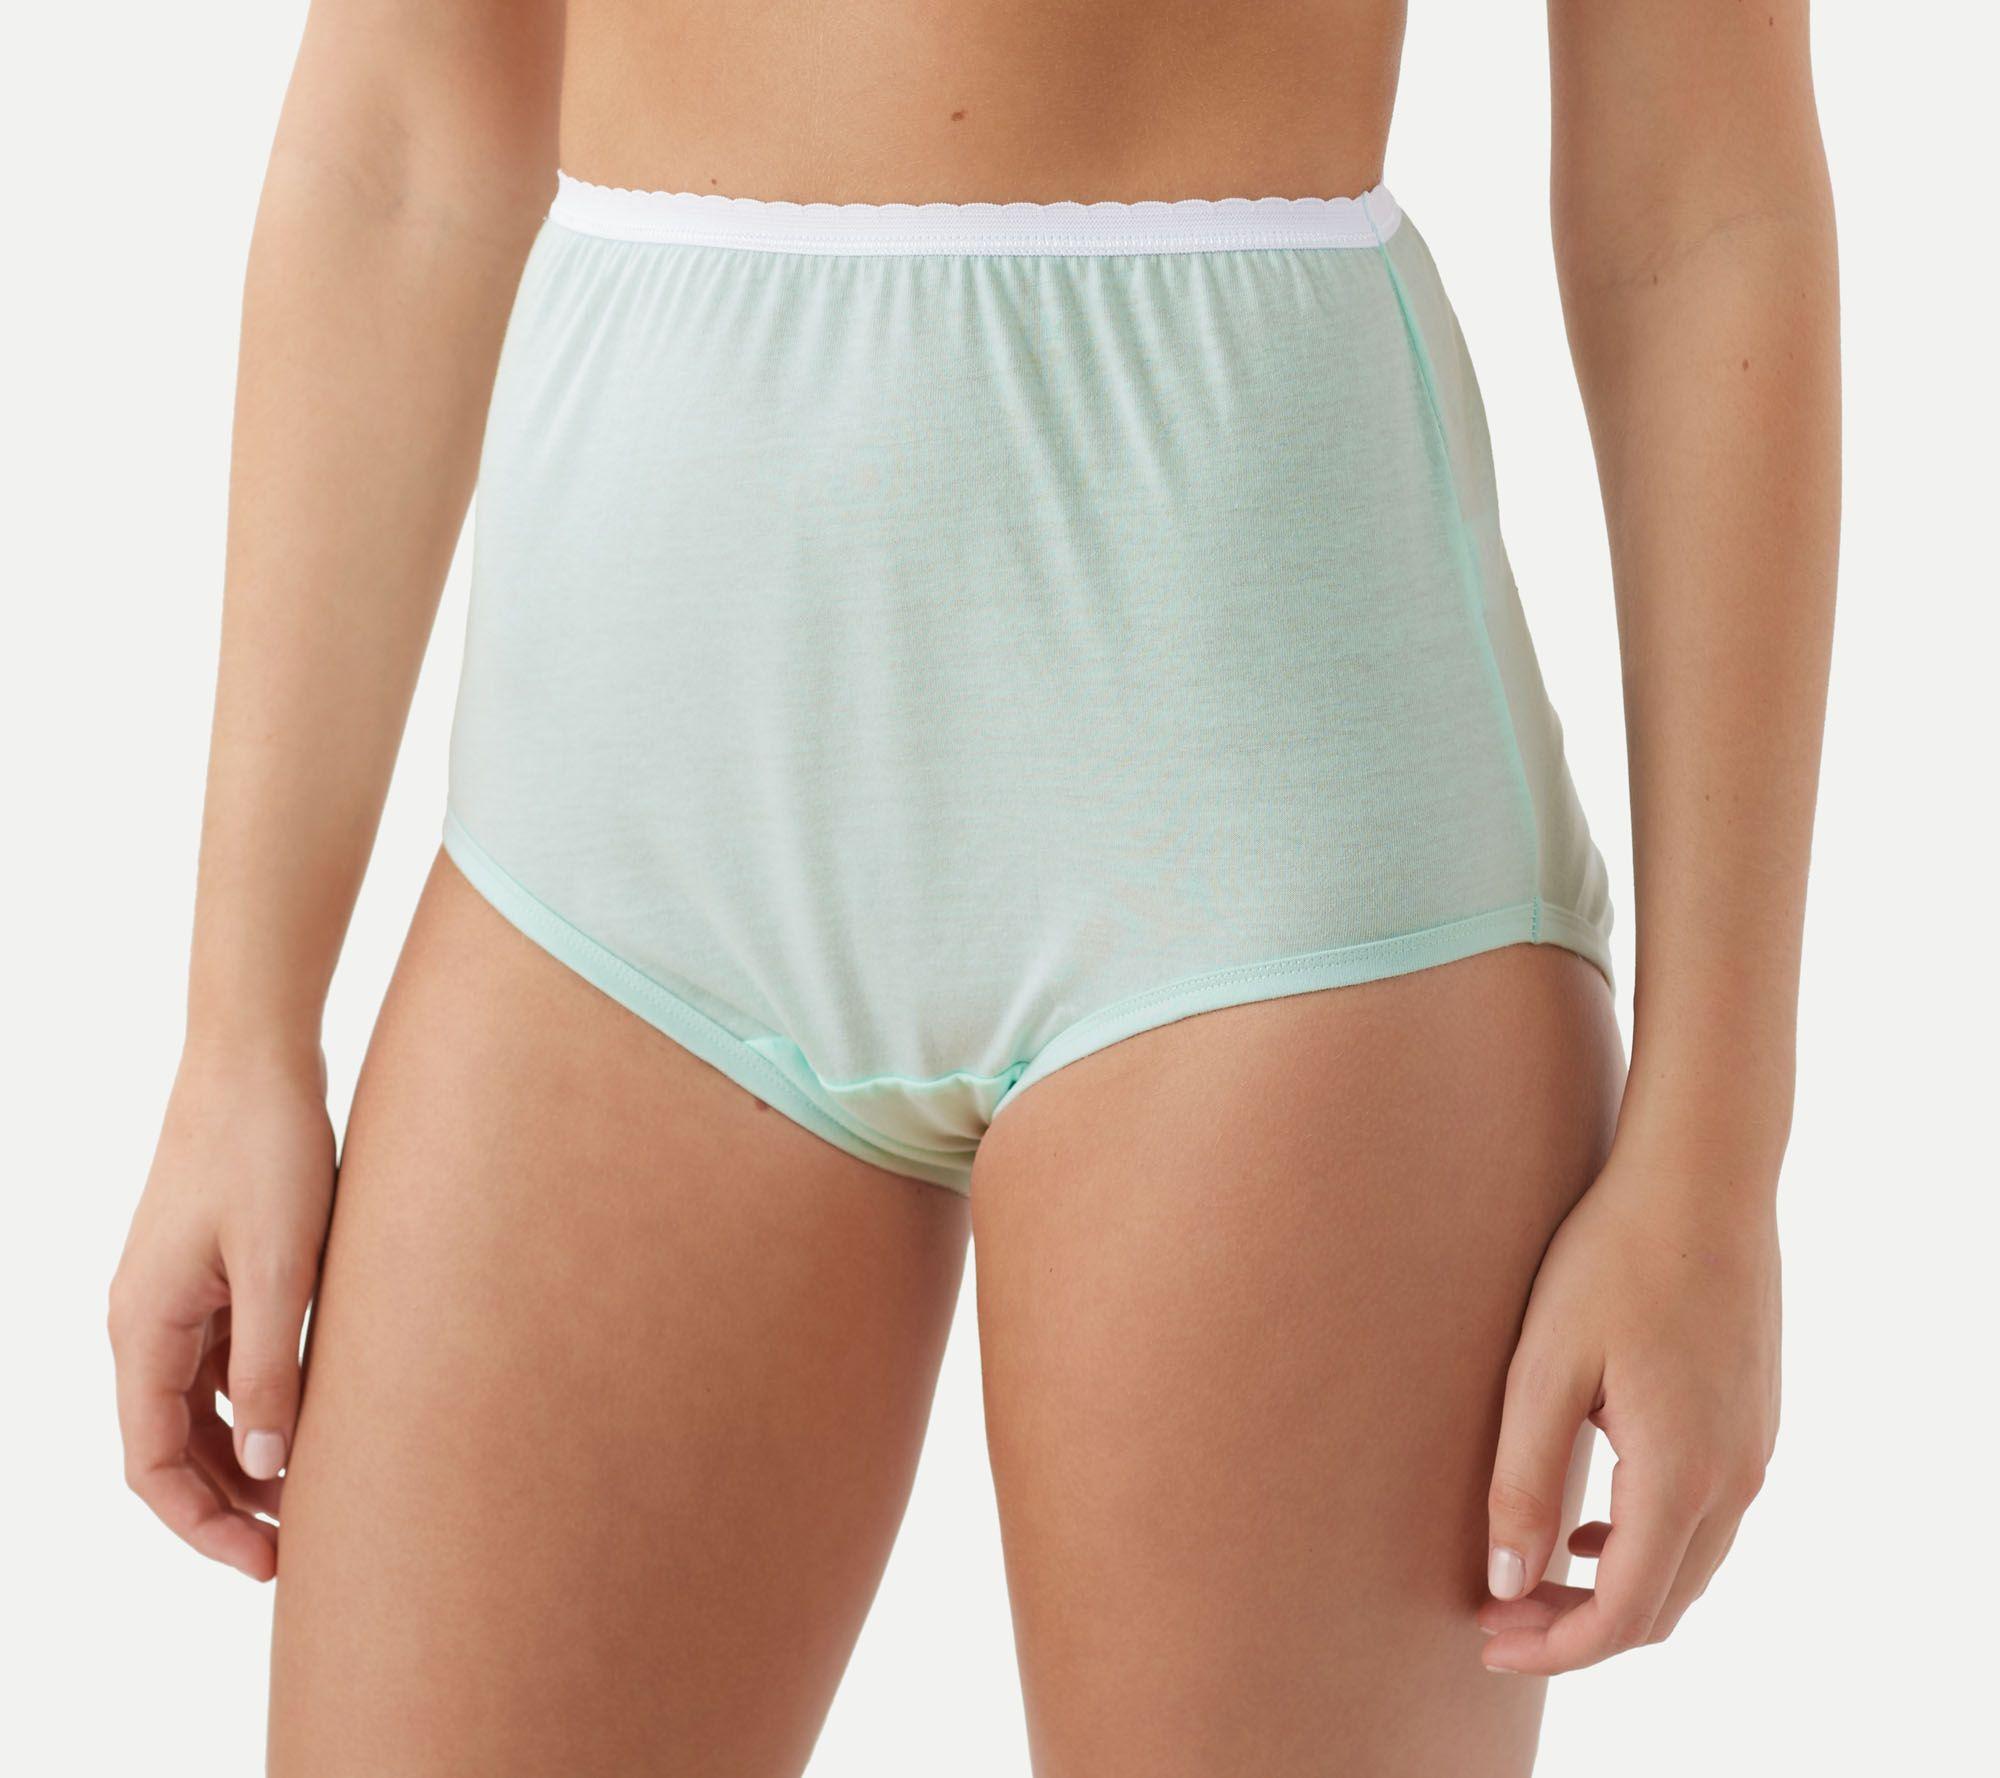 Ladies cotton turquiose knickers brand name Imani size 8//10